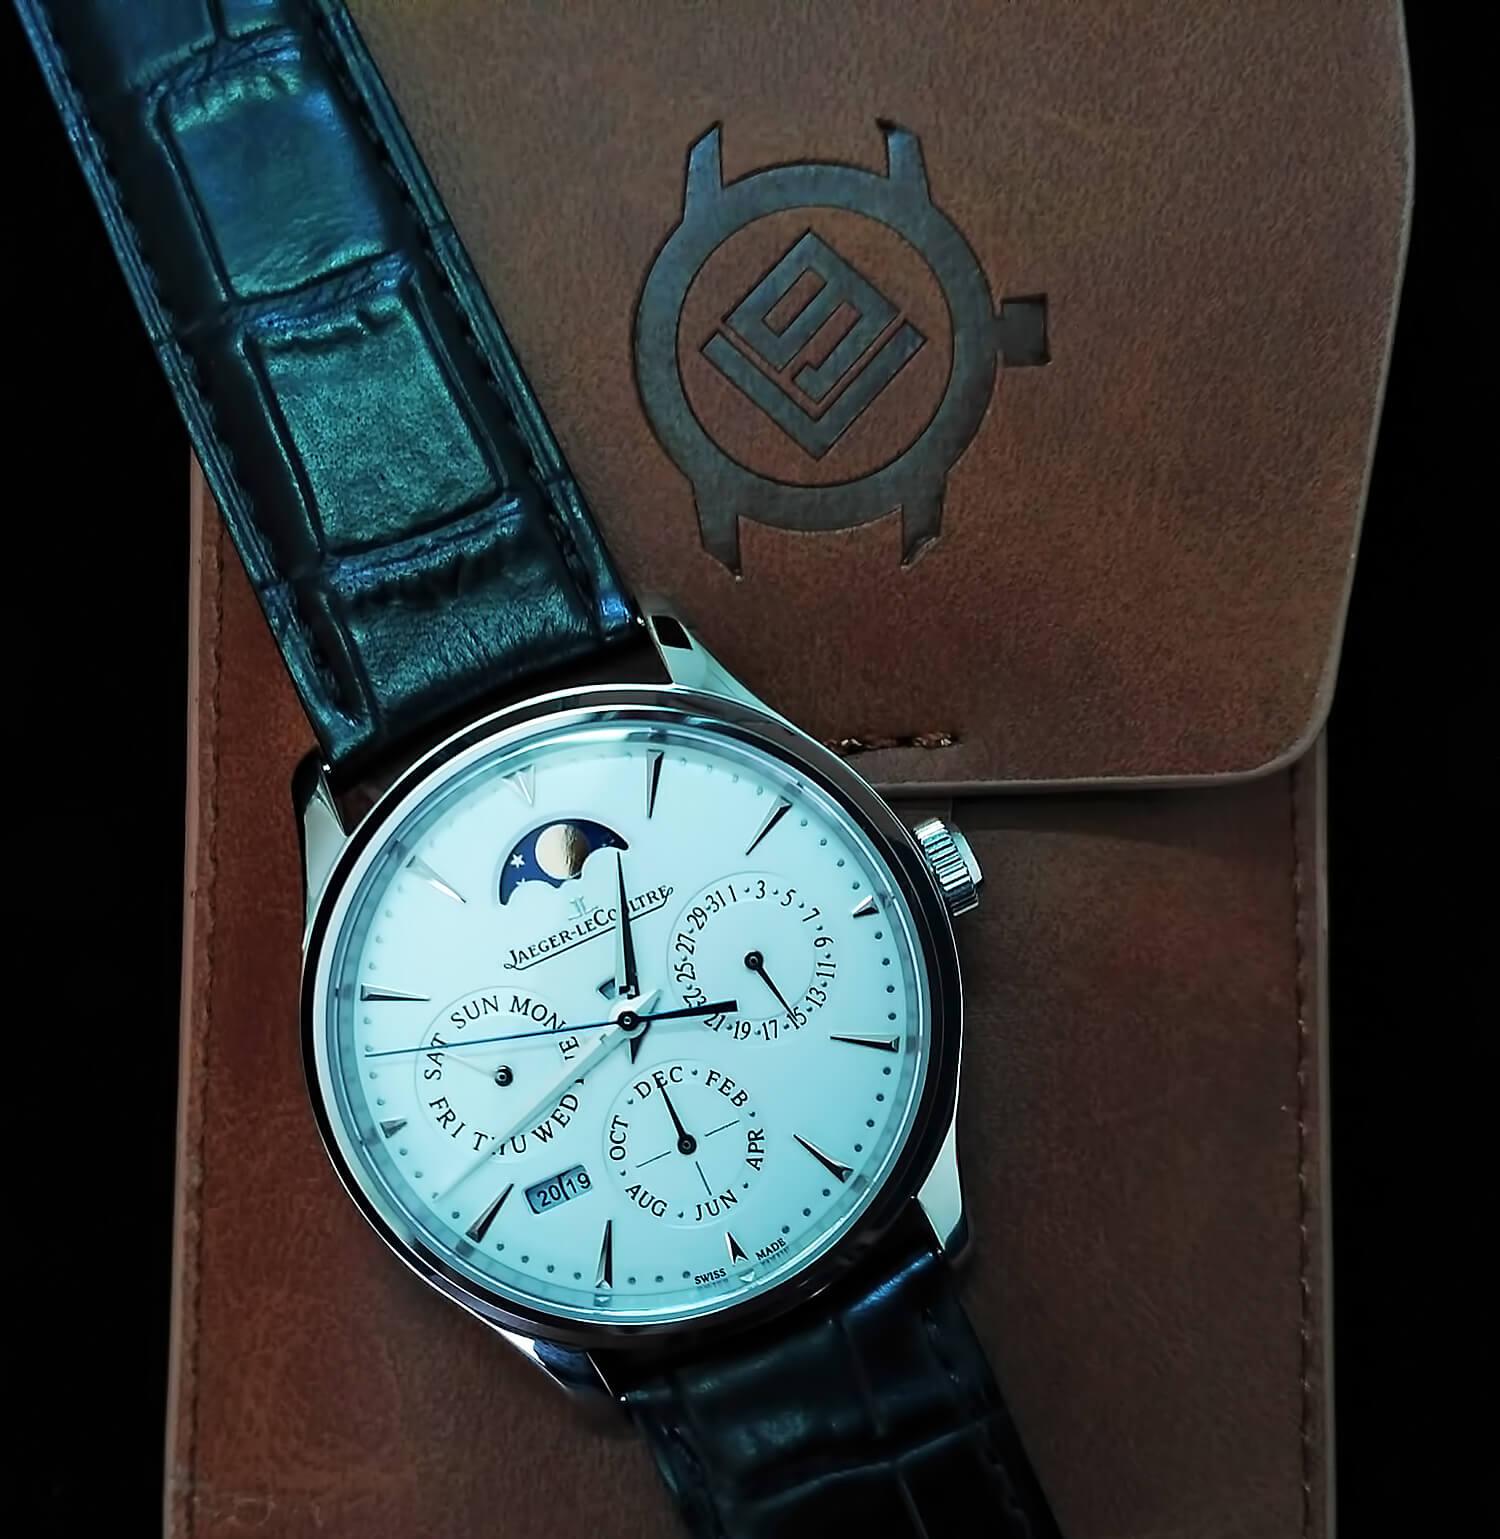 Точная реплика мужских швейцарских часов Jaeger-LeCoultre Master Ultra Thin Perpetual